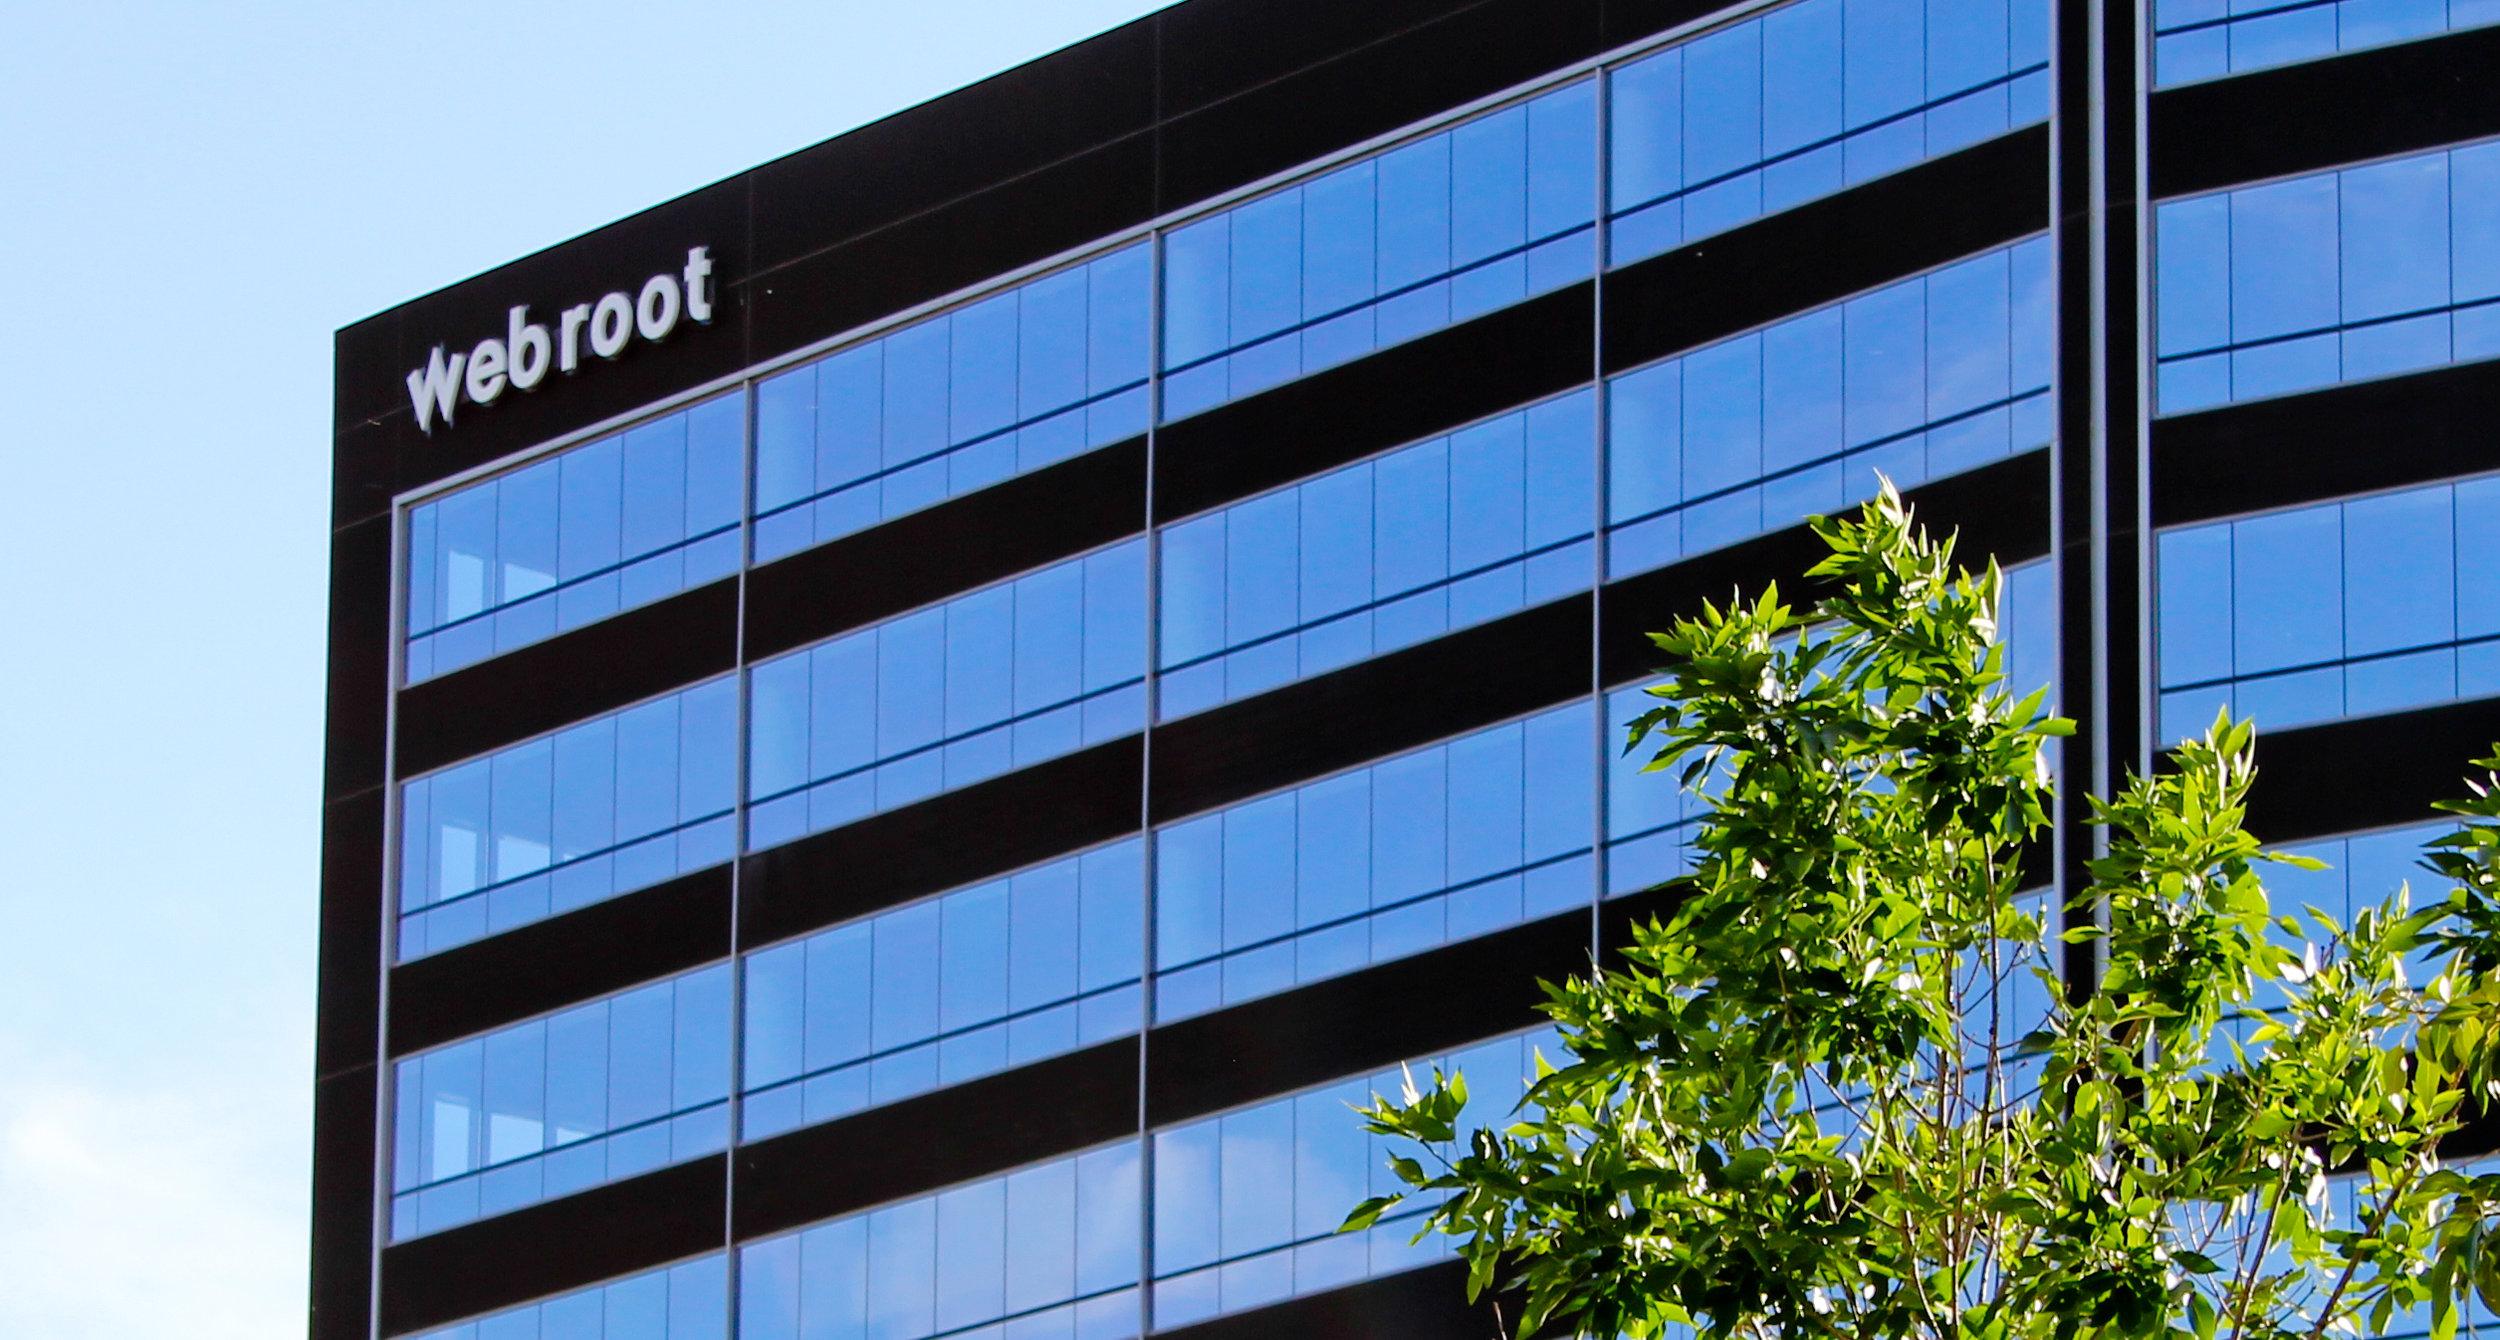 Webroot headquarters in Broomfield, CO